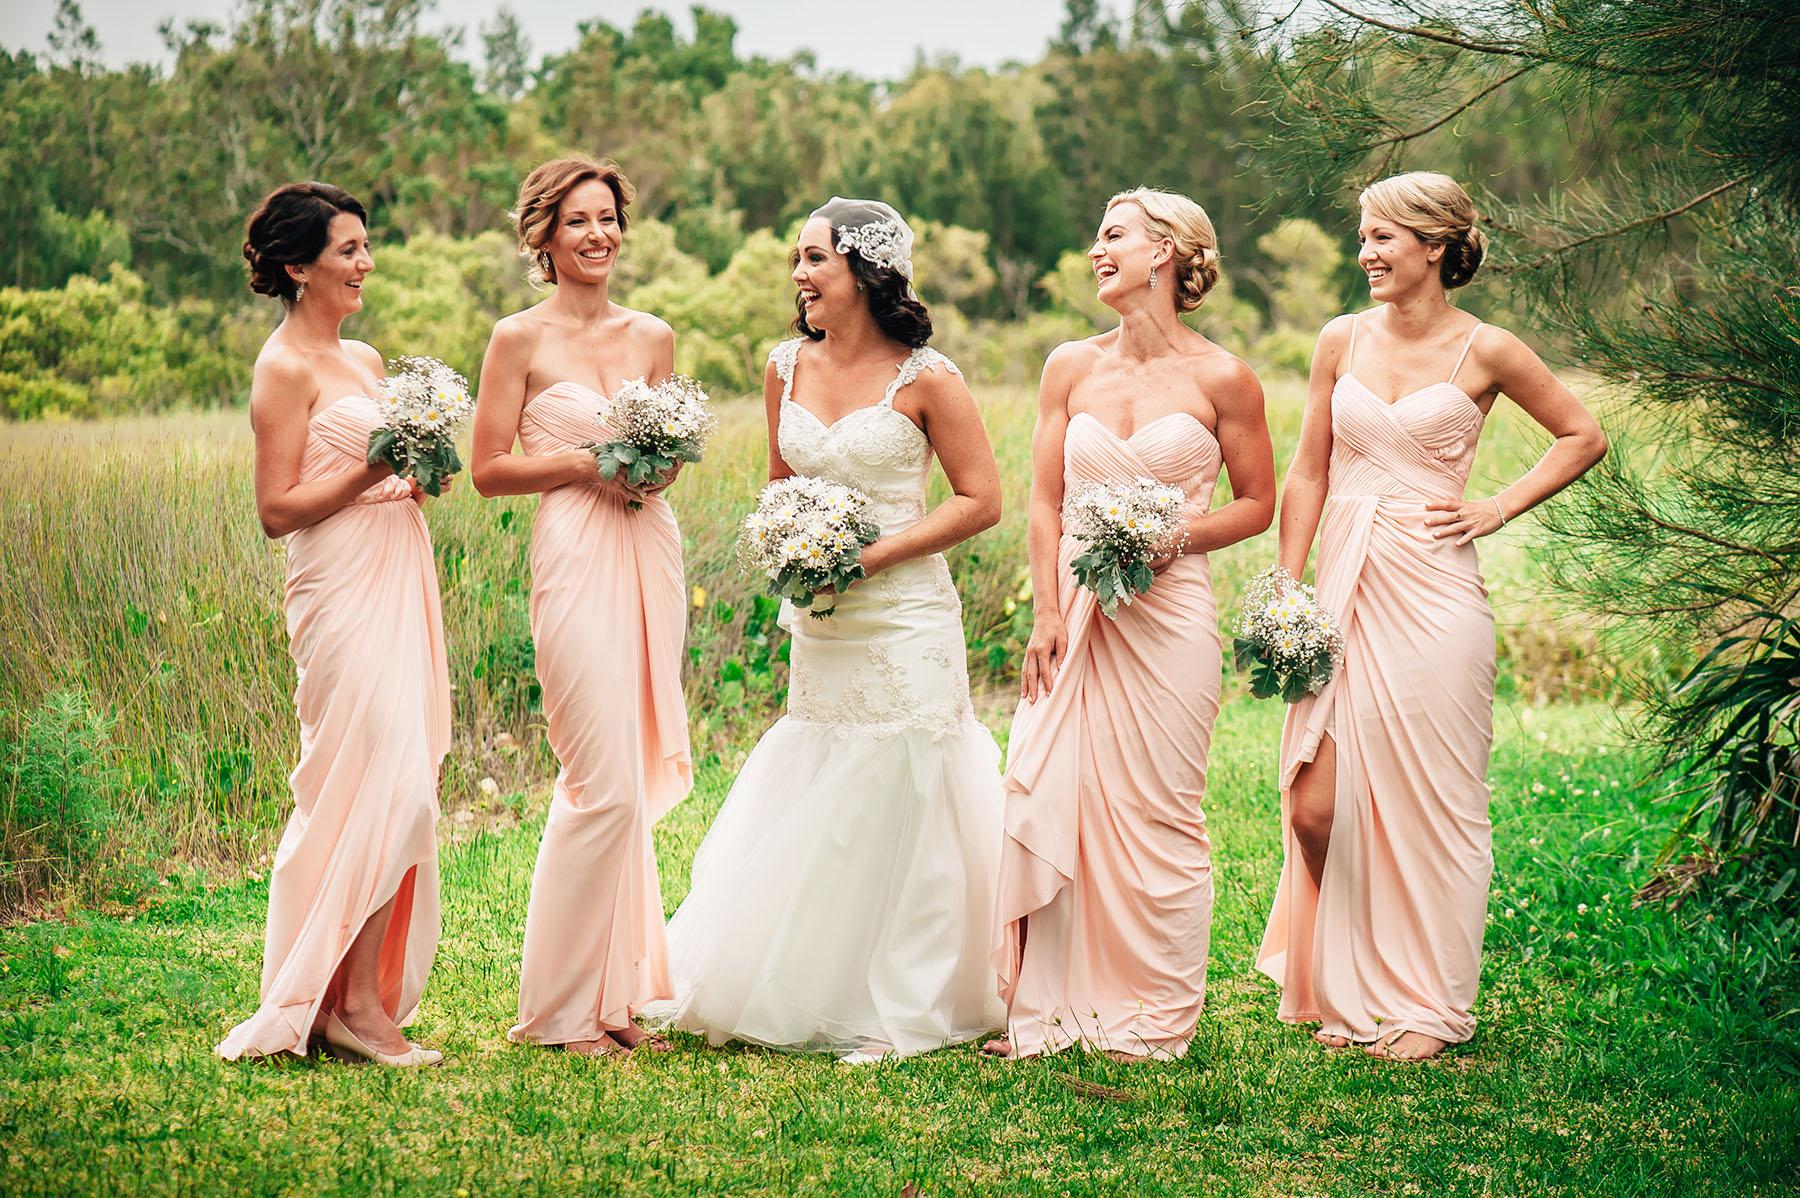 Marryme_wedding_photography_dorrigo_bellingen_photographer_34.jpg